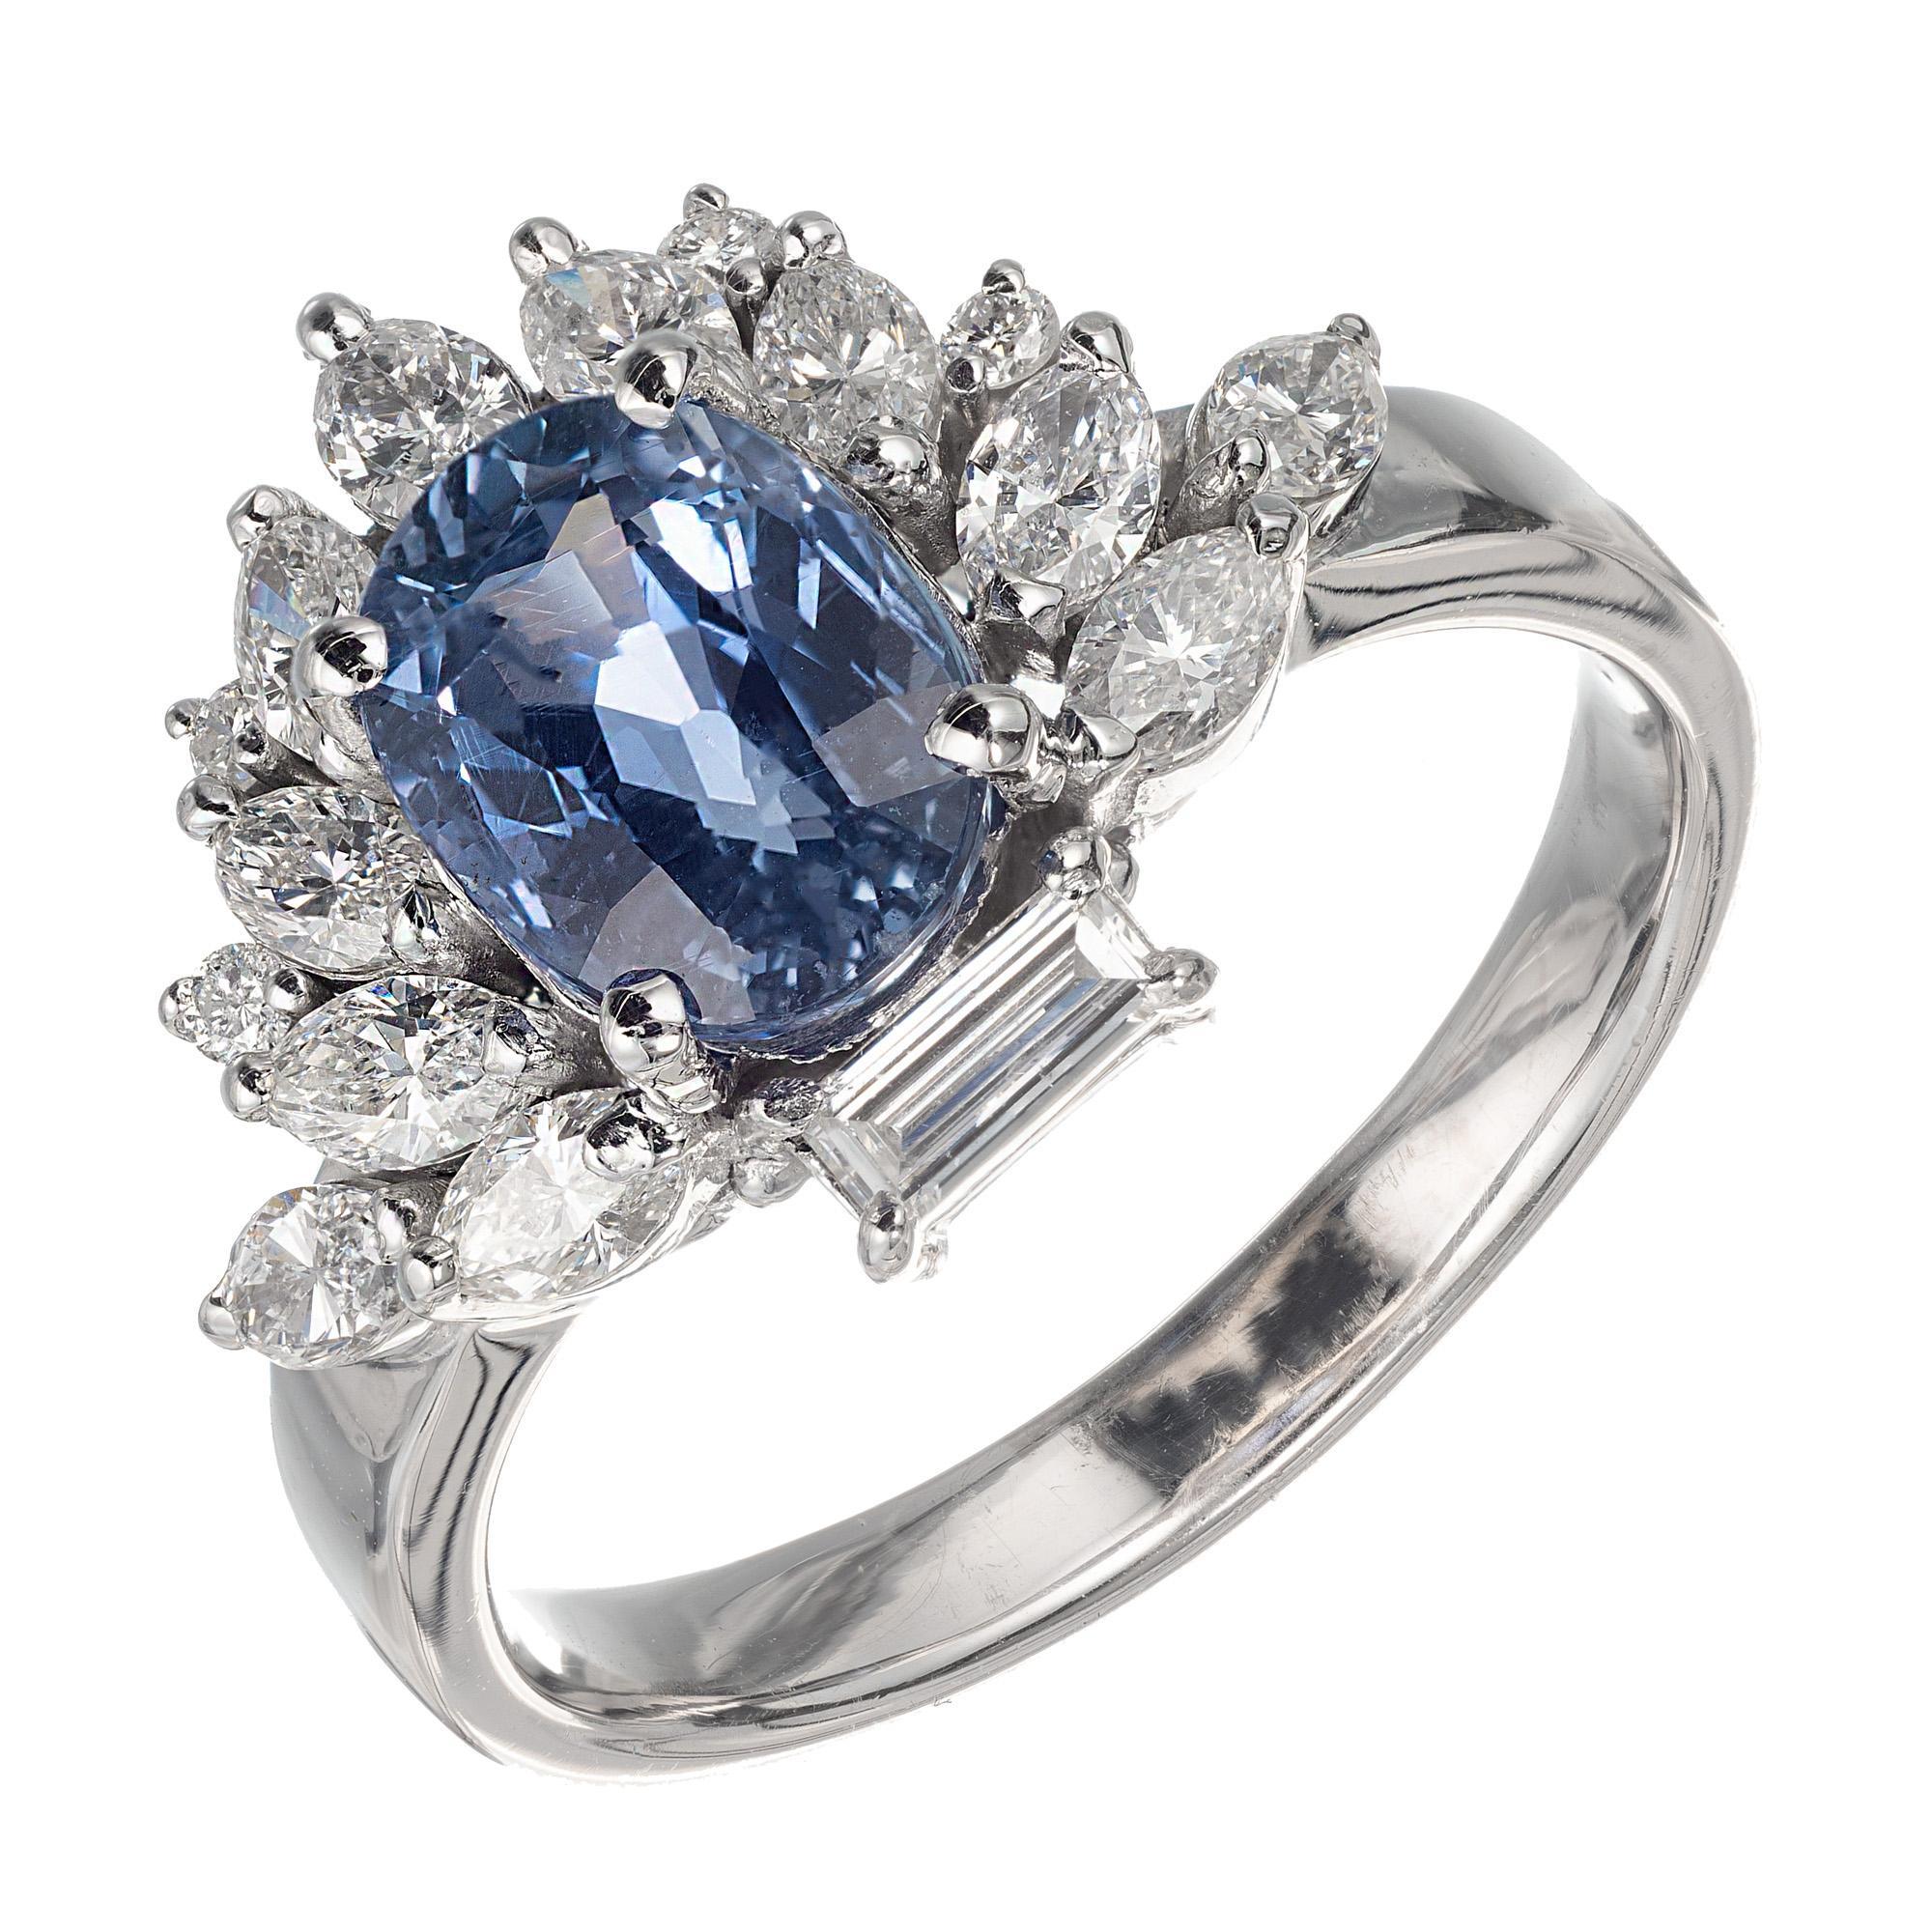 GIA Certified 2.17 Carat Periwinkle Blue Sapphire Diamond Platinum Ring